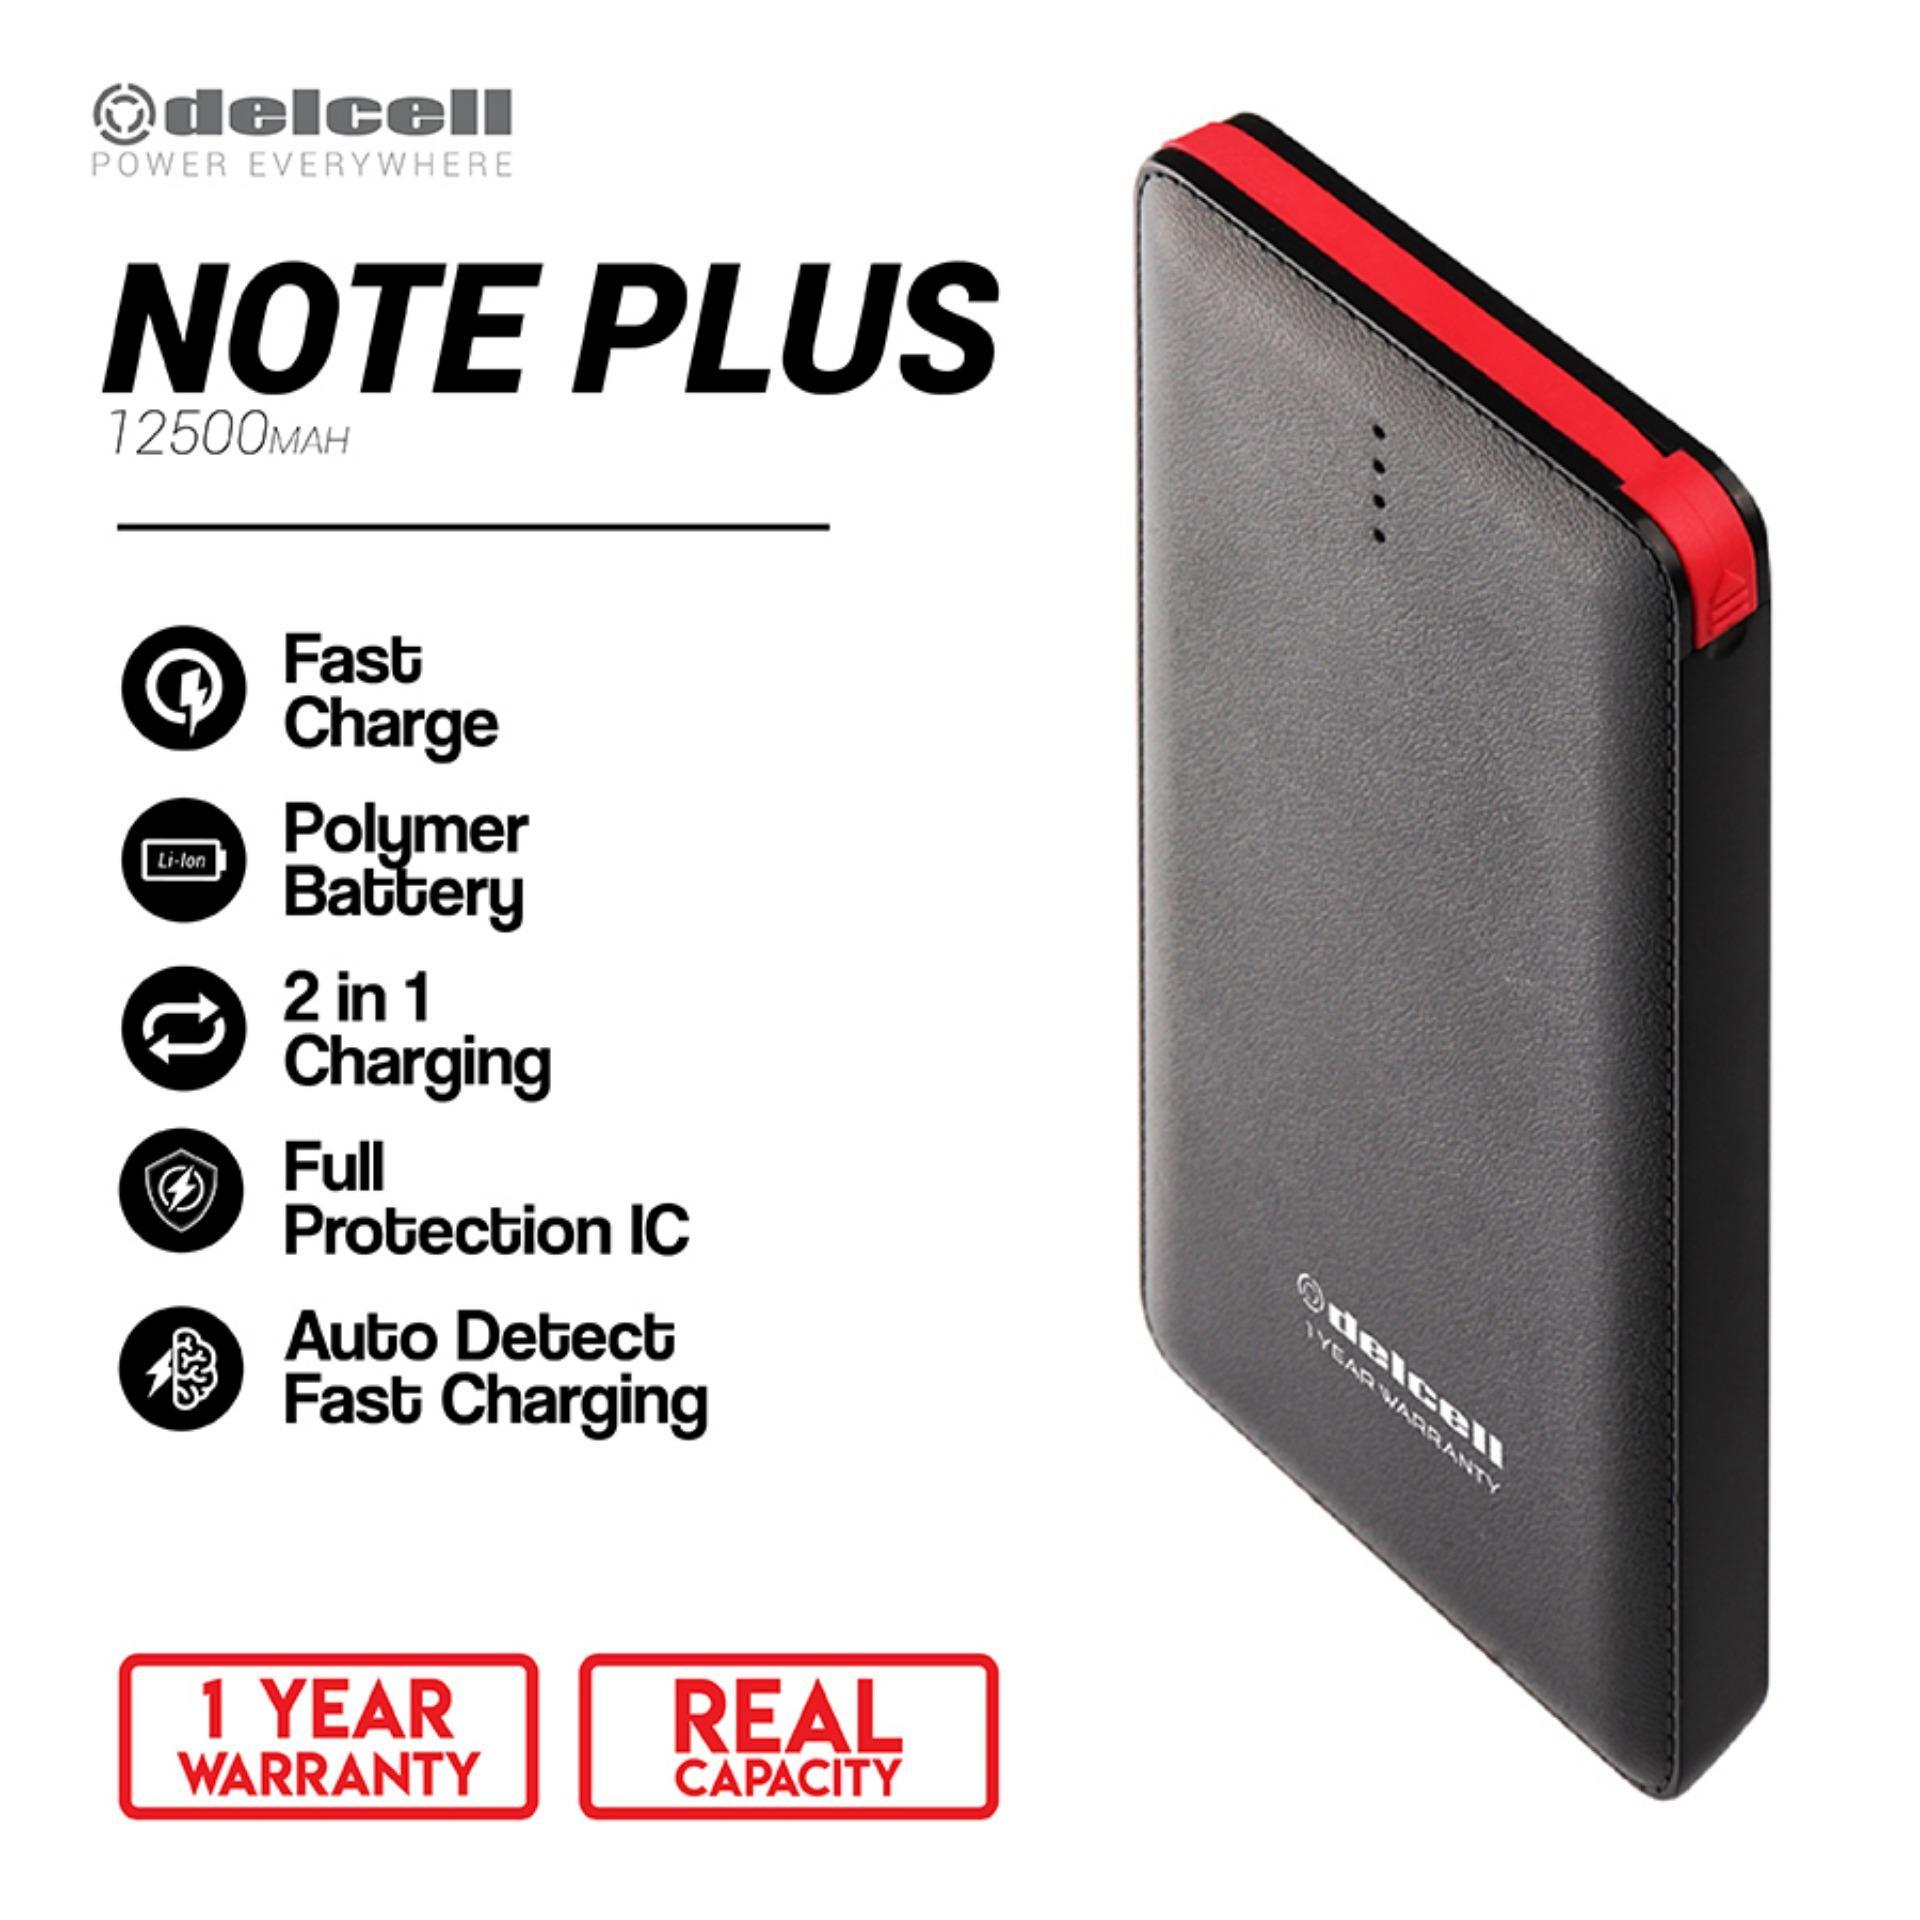 Vivan Vpb M20 Quick Charge30 20400mah Black Garansi Resmi 1 Tahun Radius Hp Nef11 Source Delcell Note Plus Powerbank Polymer Battery